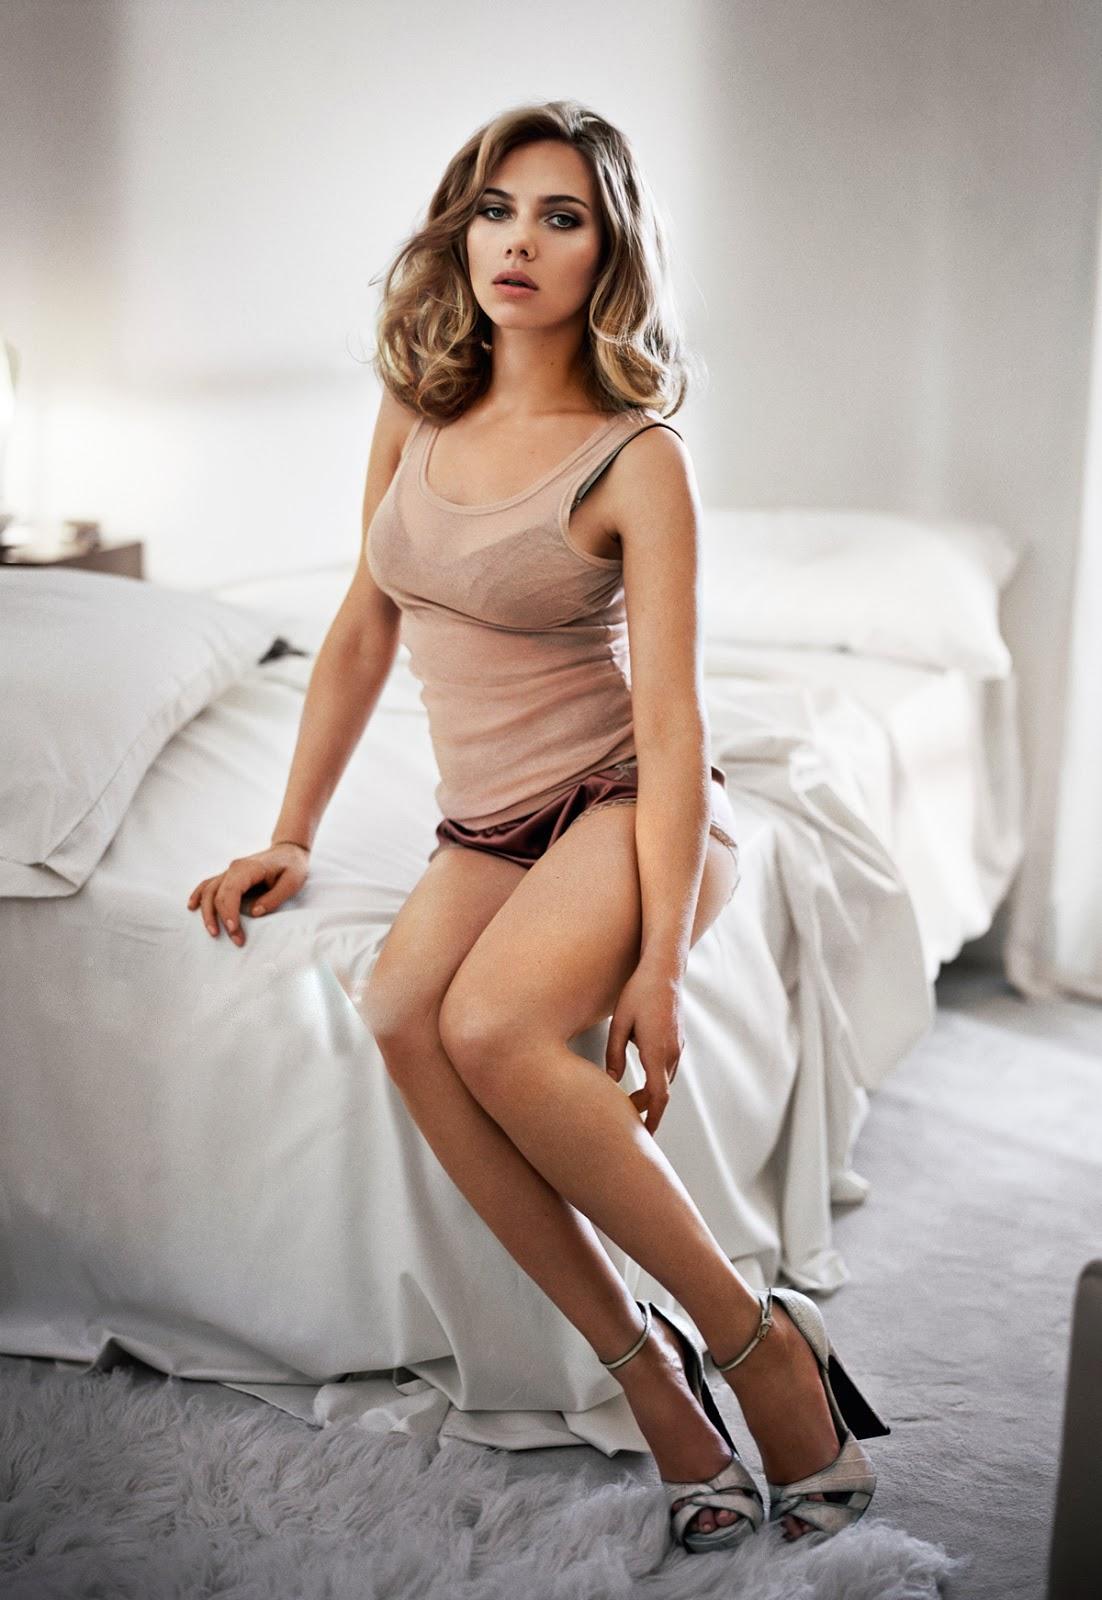 Scarlett Johansson Actress Wiki,Bio,Age,Profile,Boyfriend,Images | Full Details